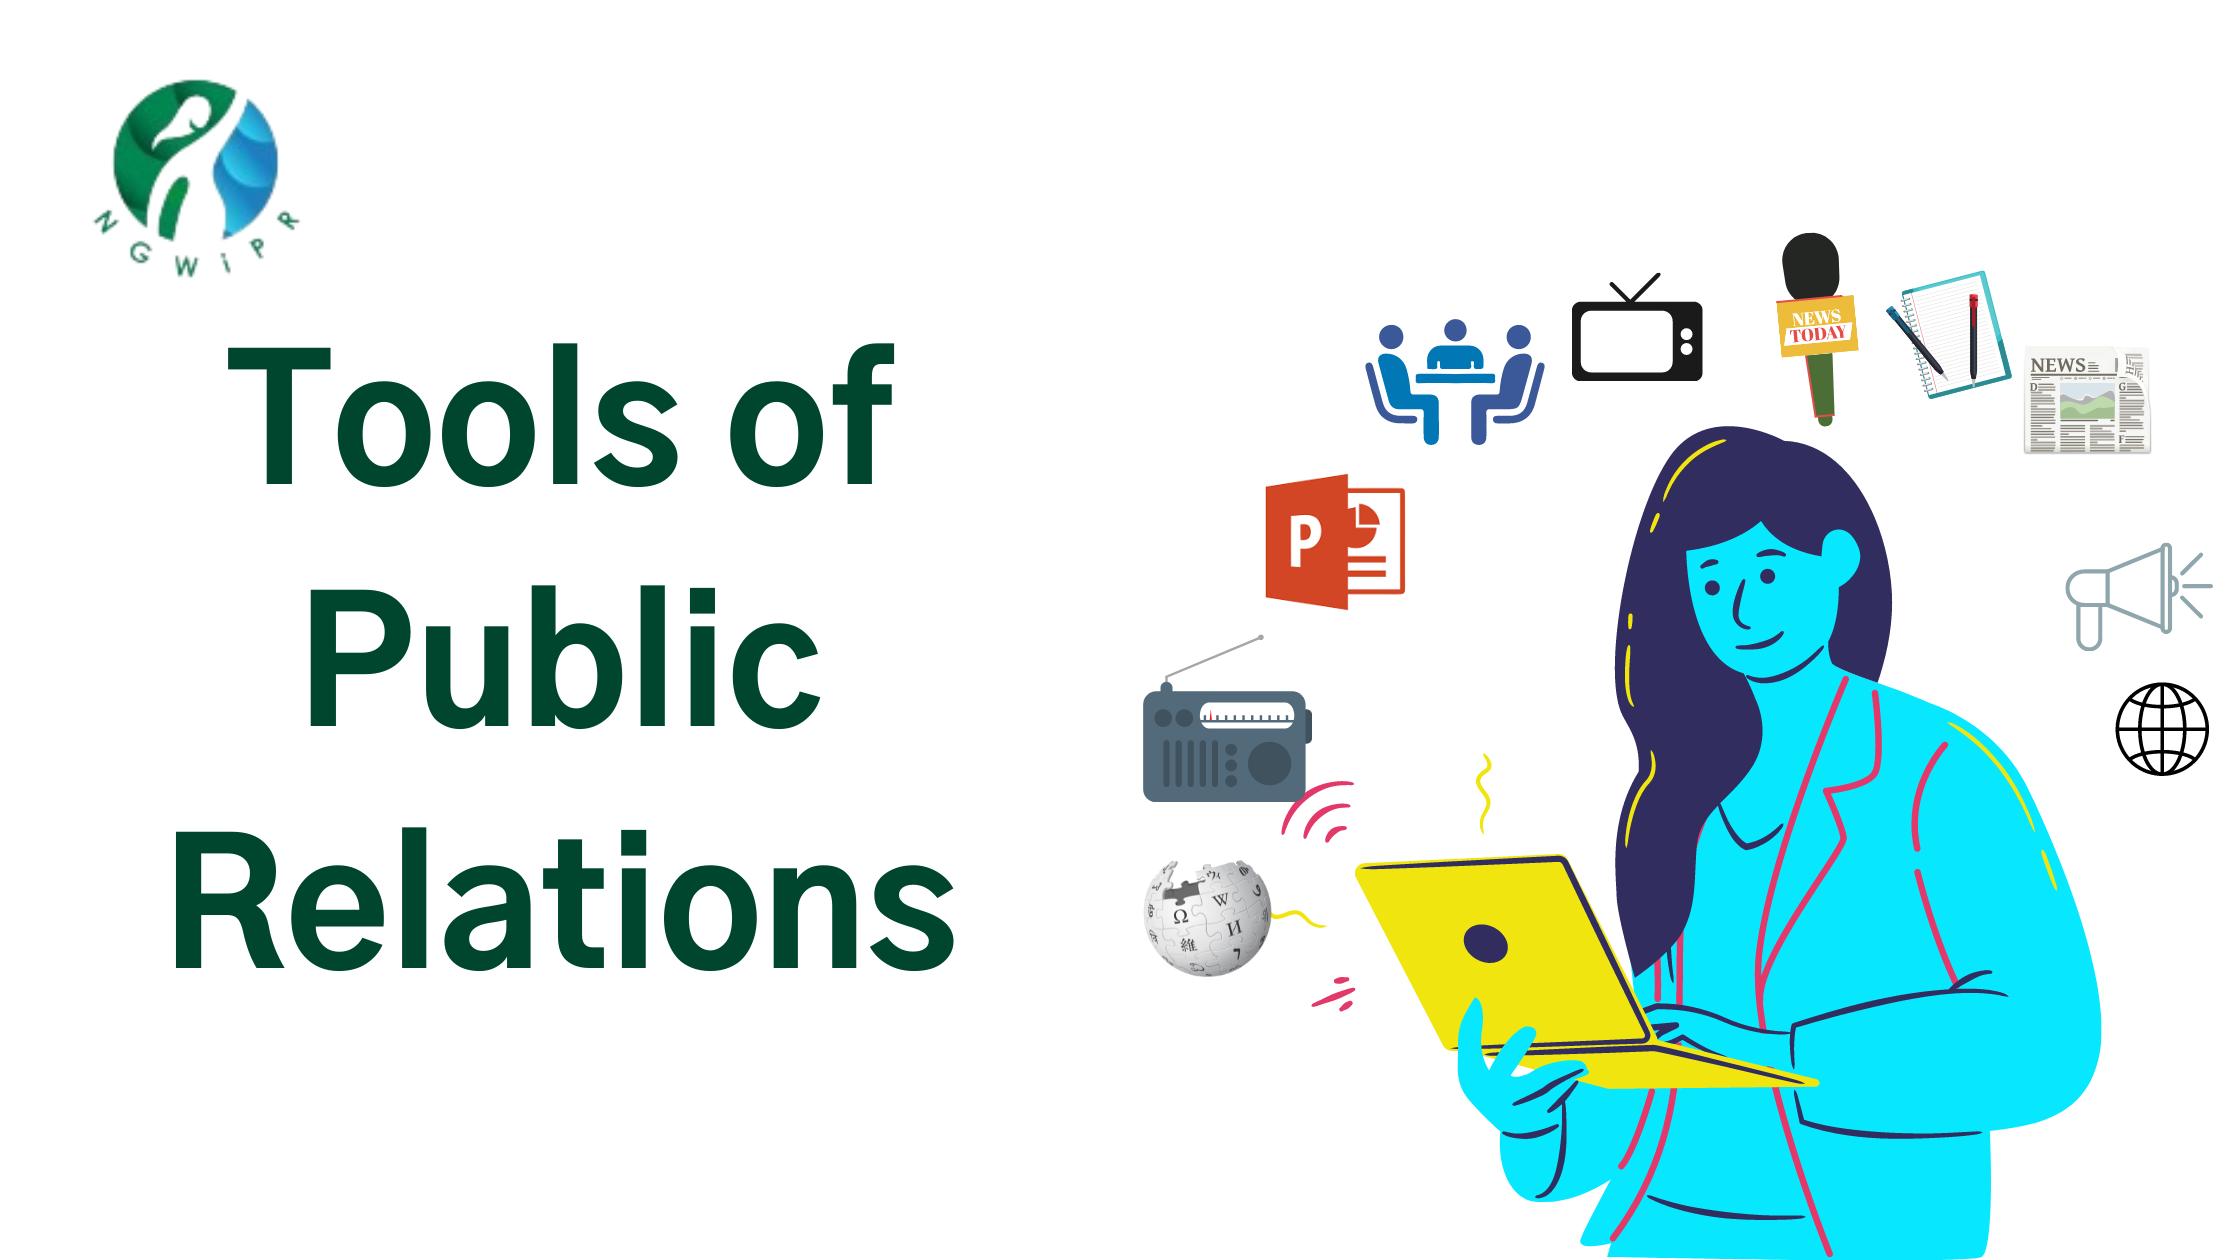 Tools of Public Relations